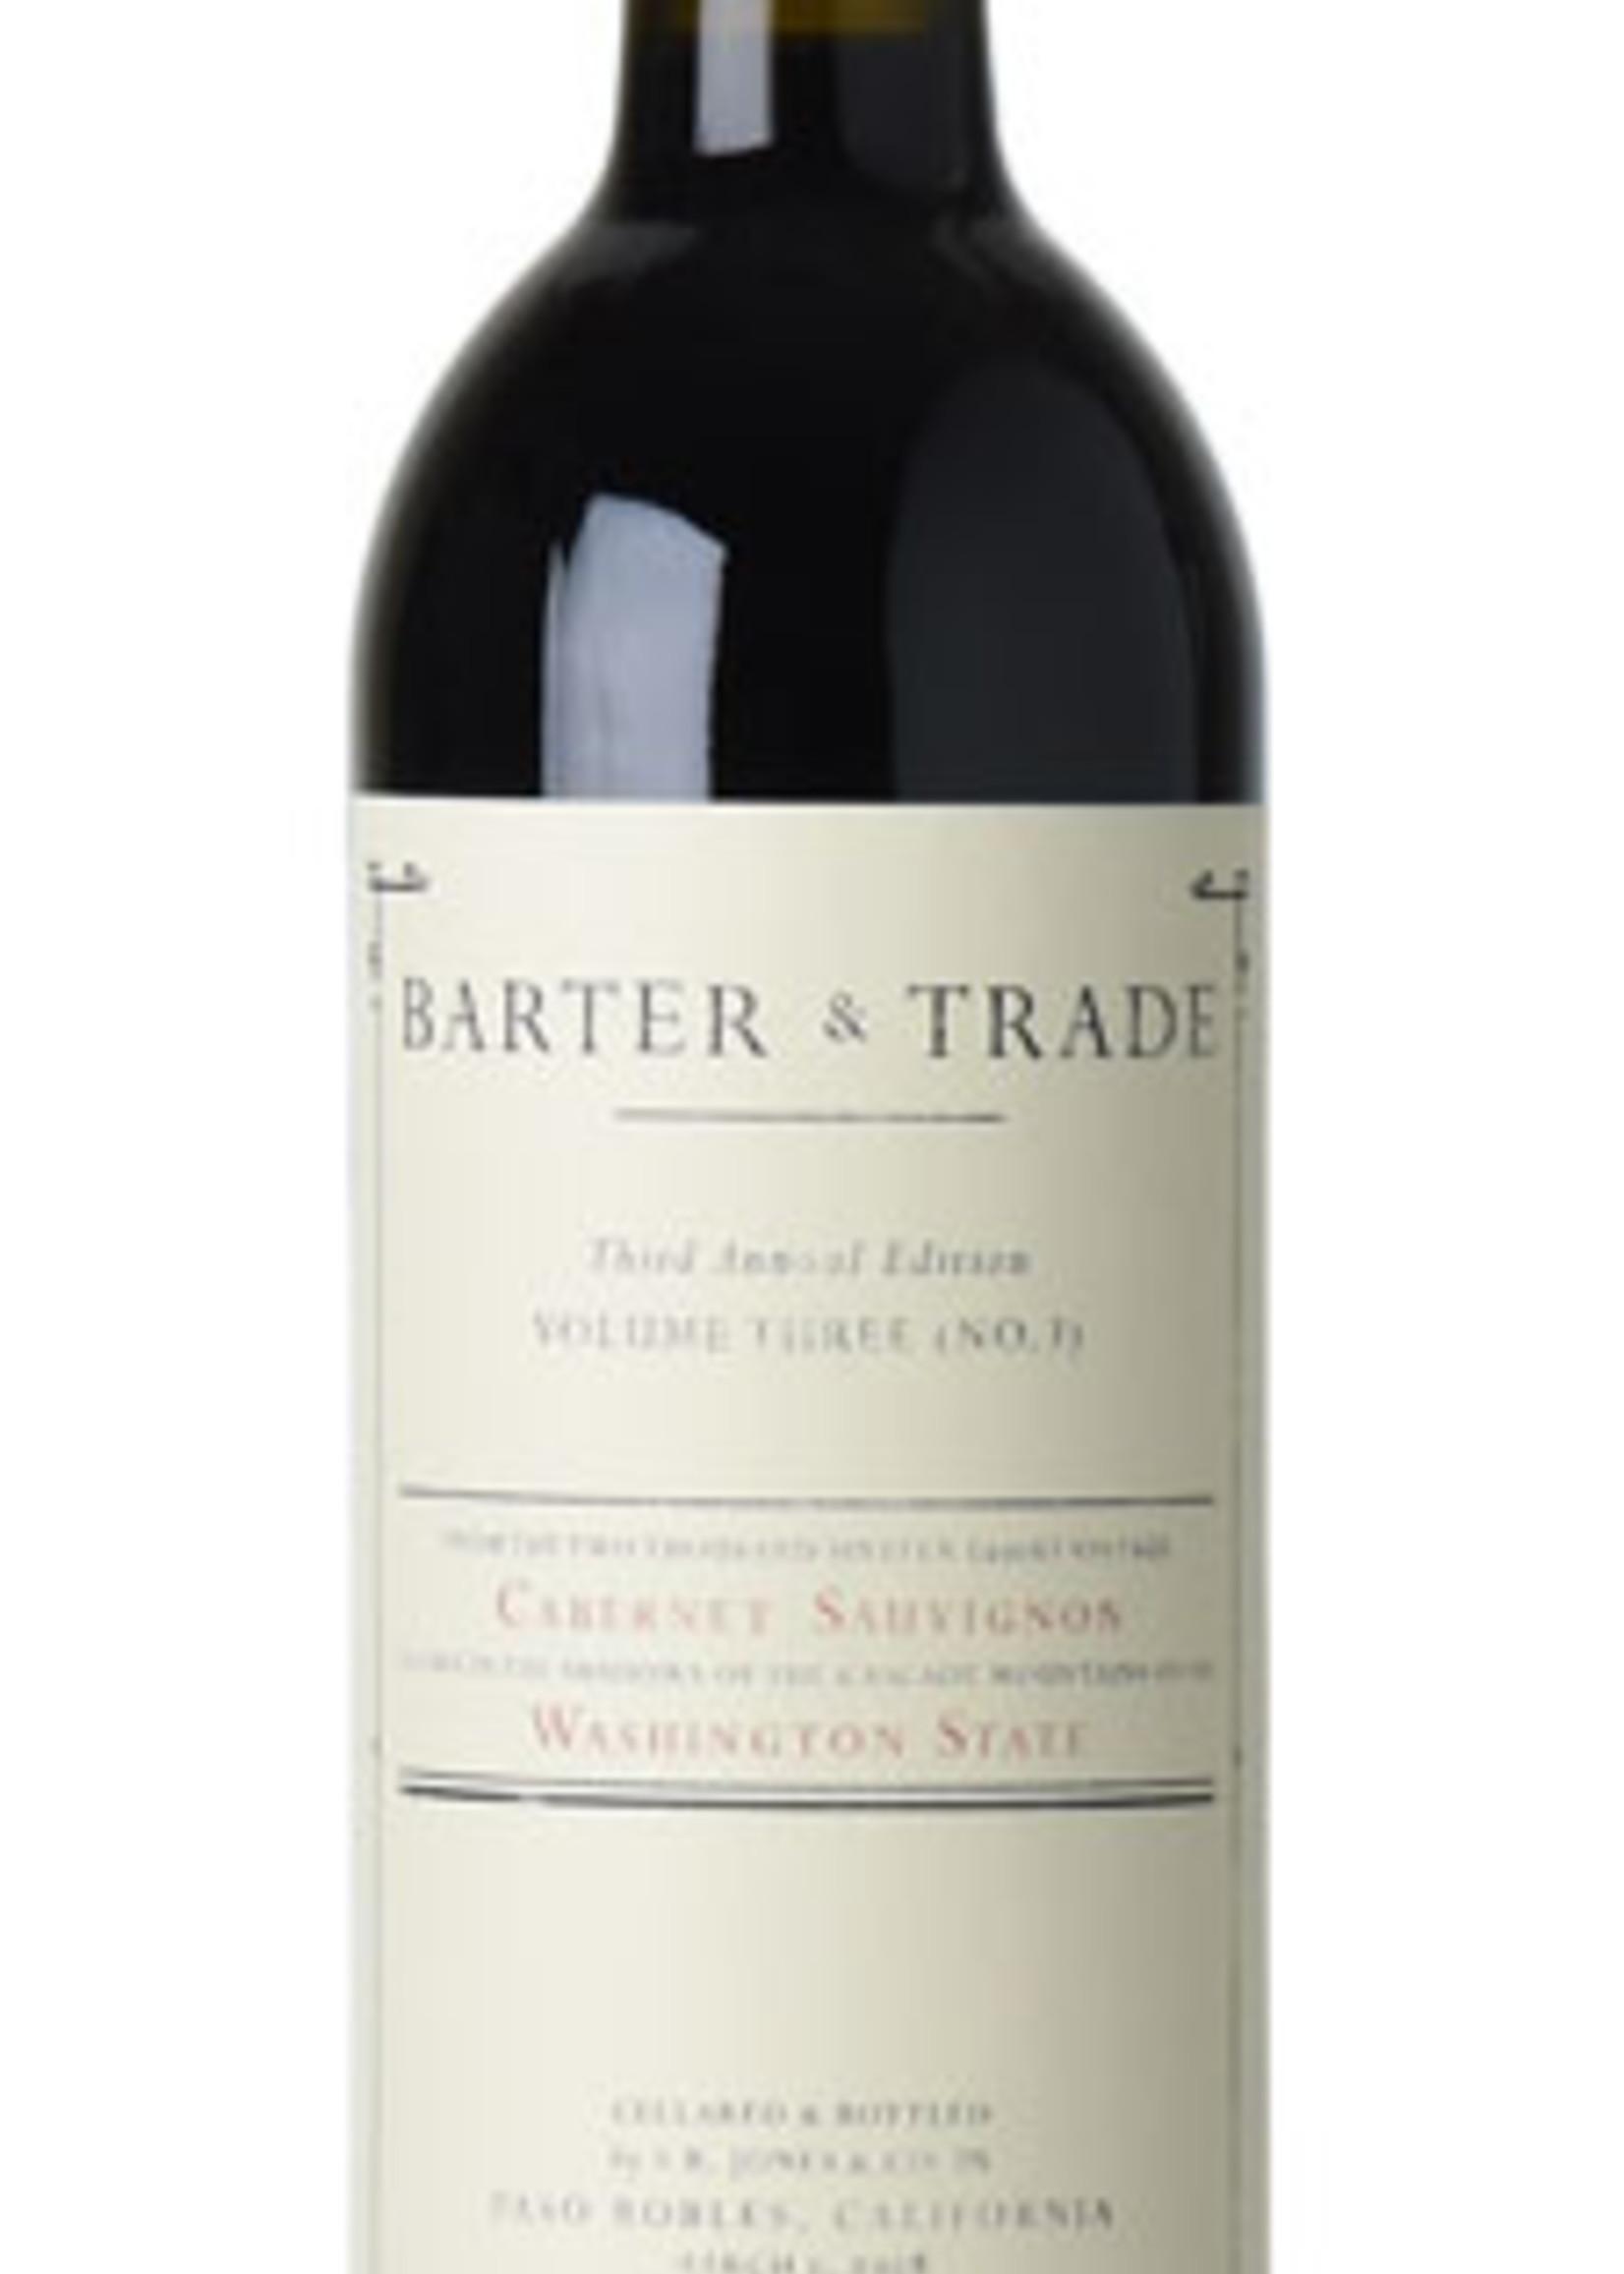 Barter & Trade Cabernet Sauvignon, WA